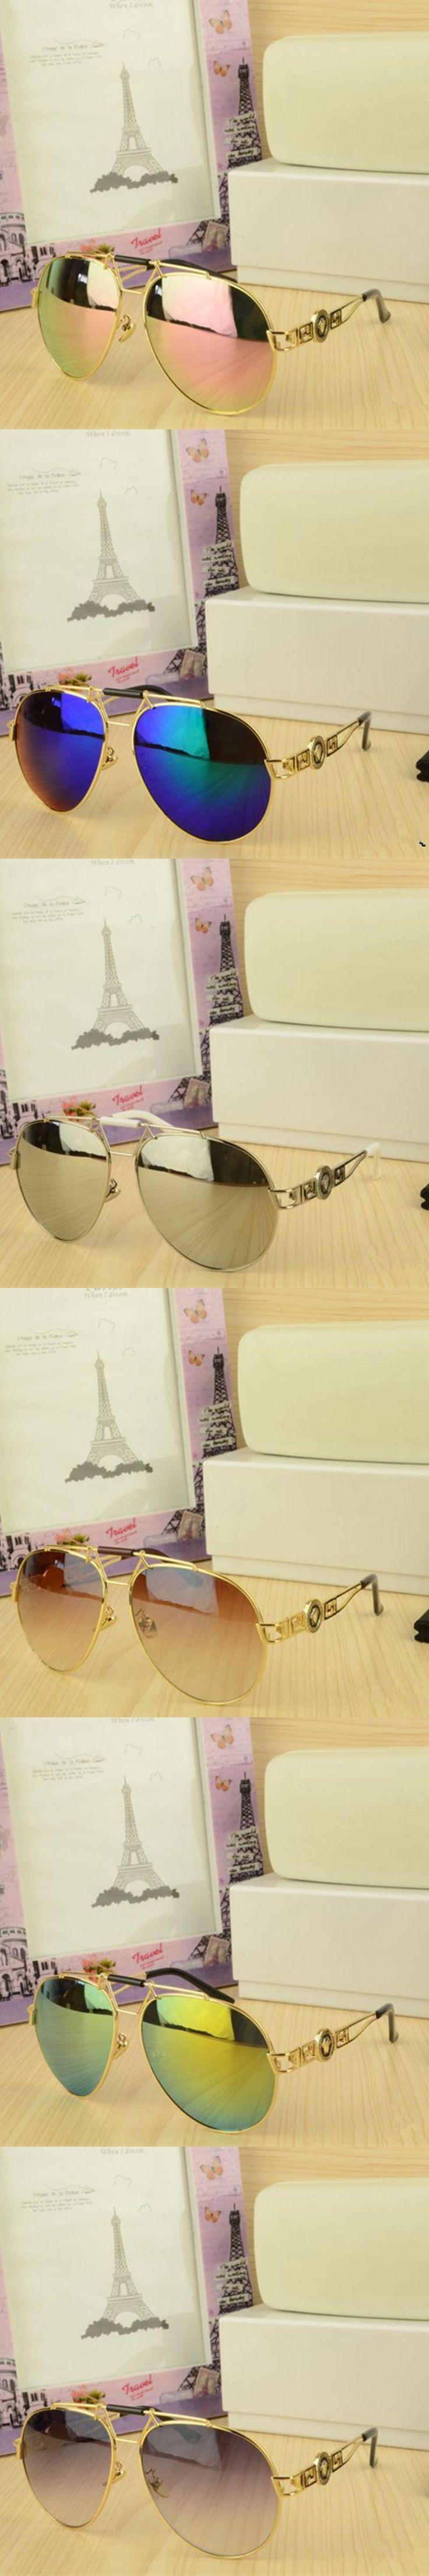 2018 New fashion sunglasses metal leather decoration frame luxury brand designer women mirror sunglasses men uv400 shades